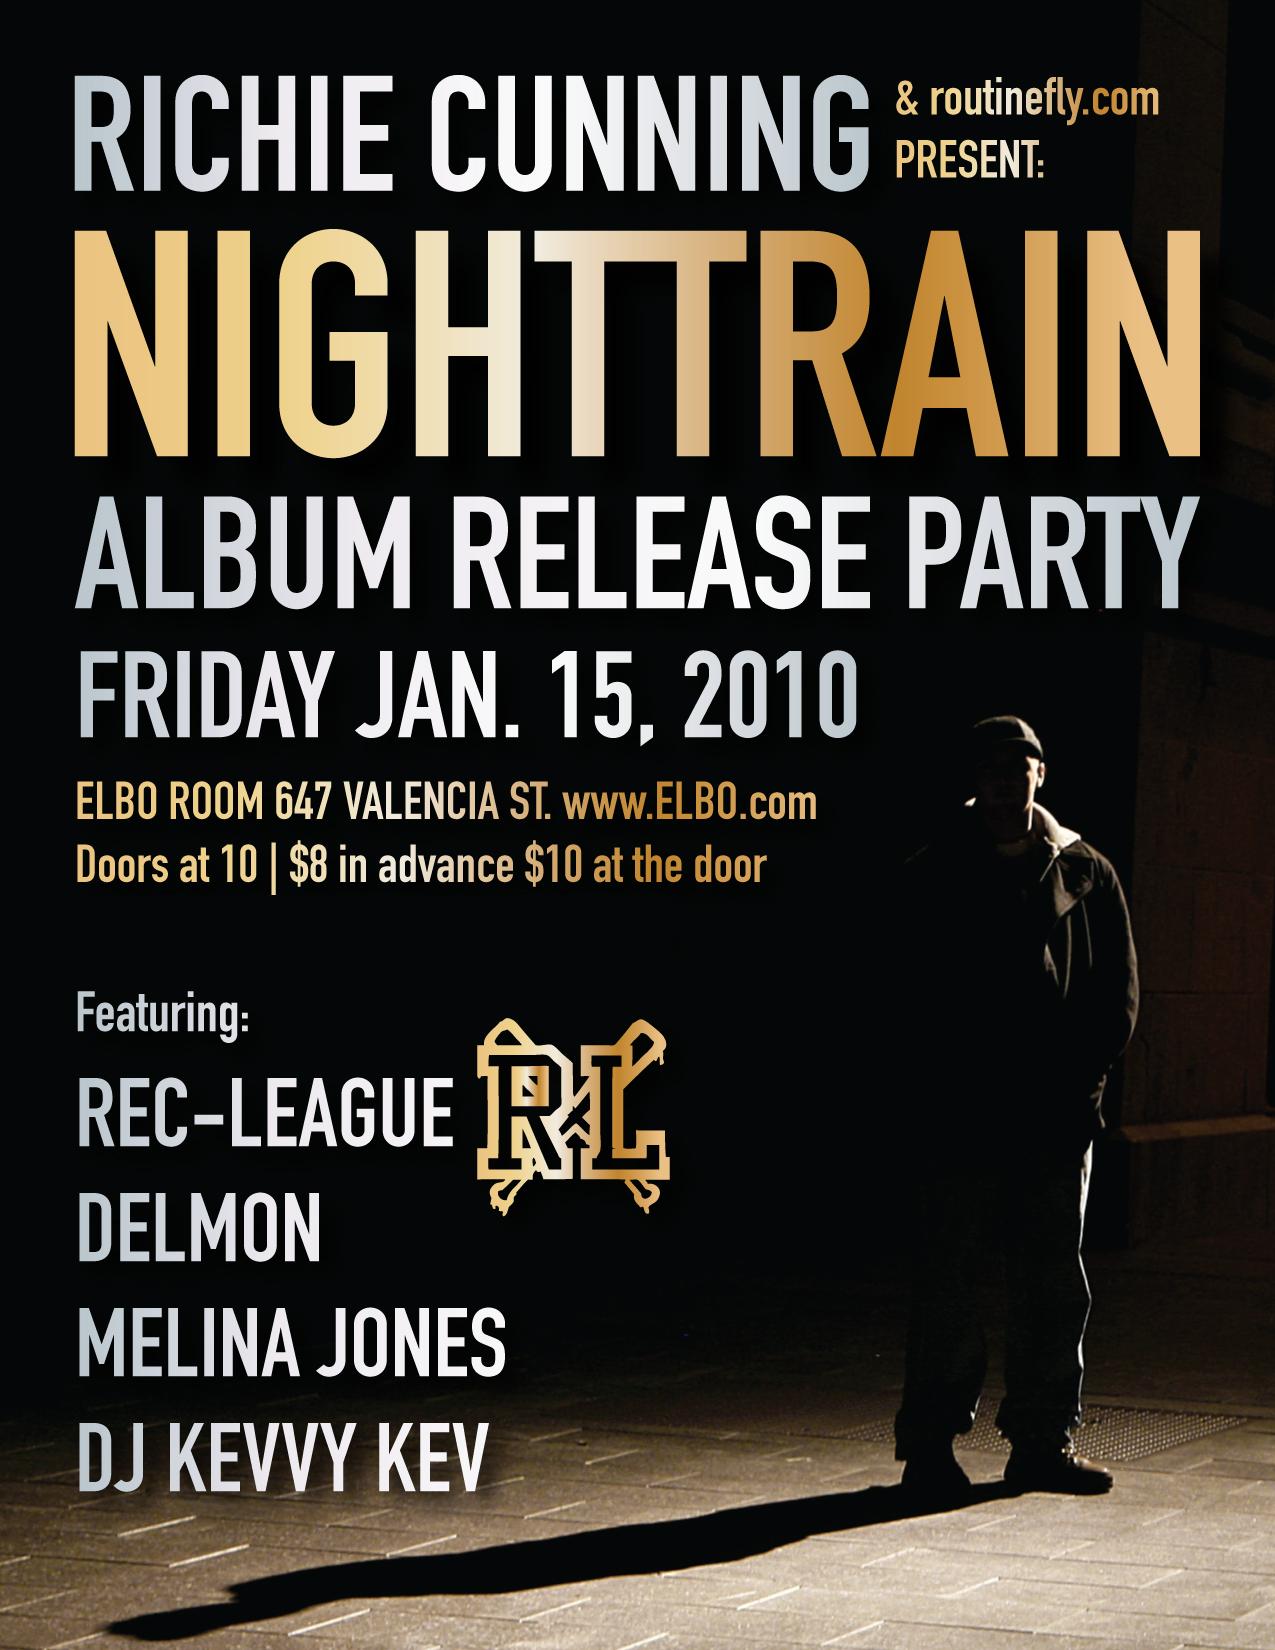 Night Train Album Release Party San Francisco CA